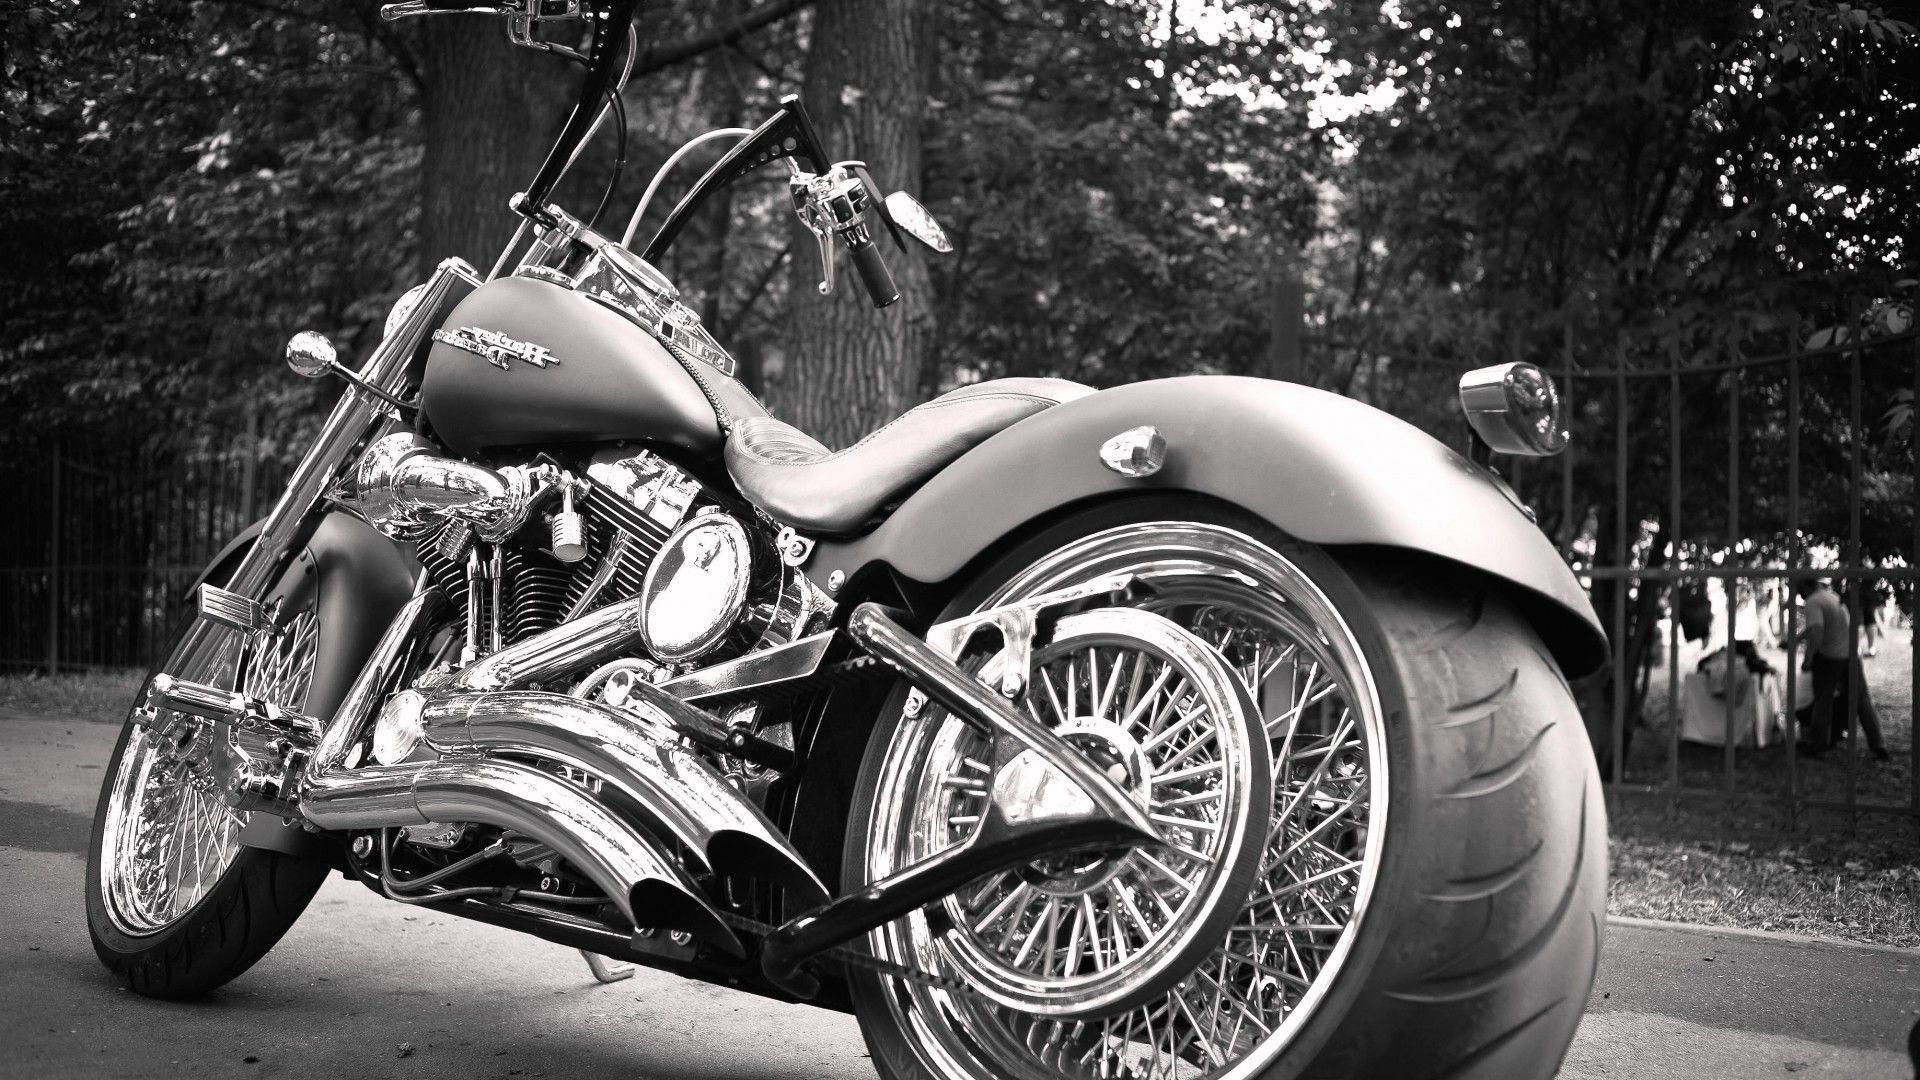 Harley Davidson Wallpapers And Screensavers: Vintage Harley-Davidson Wallpapers